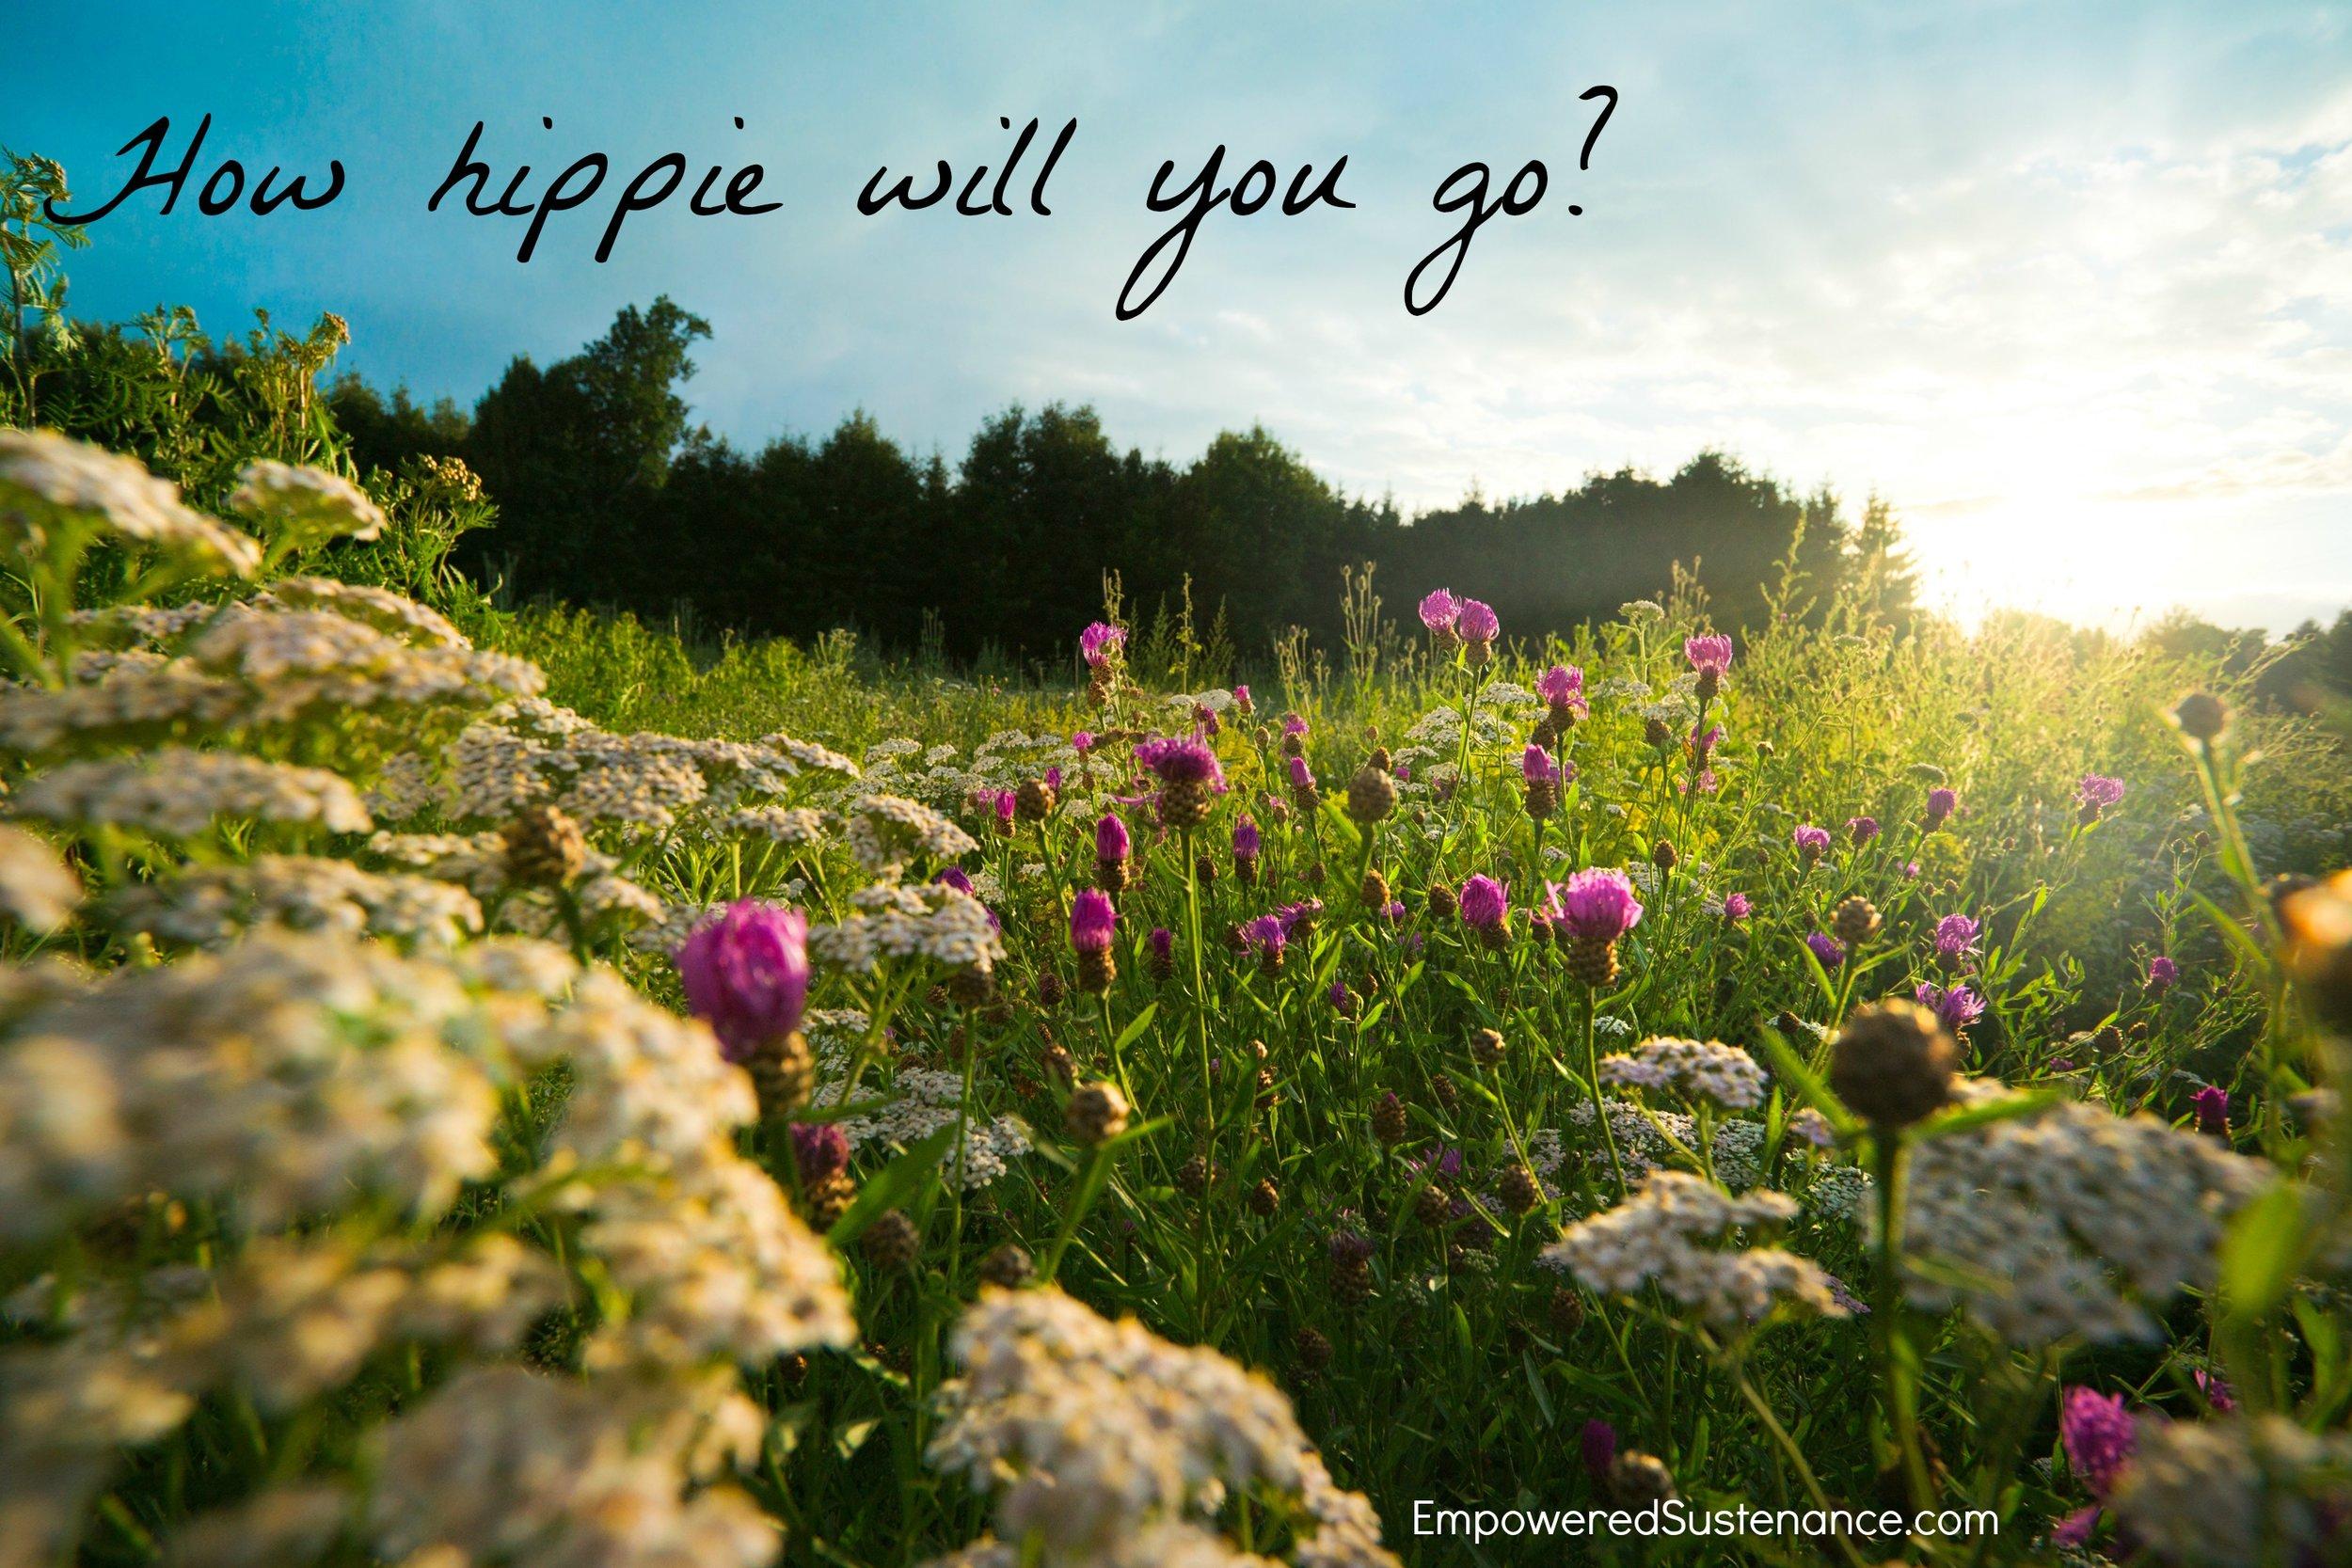 how-hippie-will-you-go.jpg